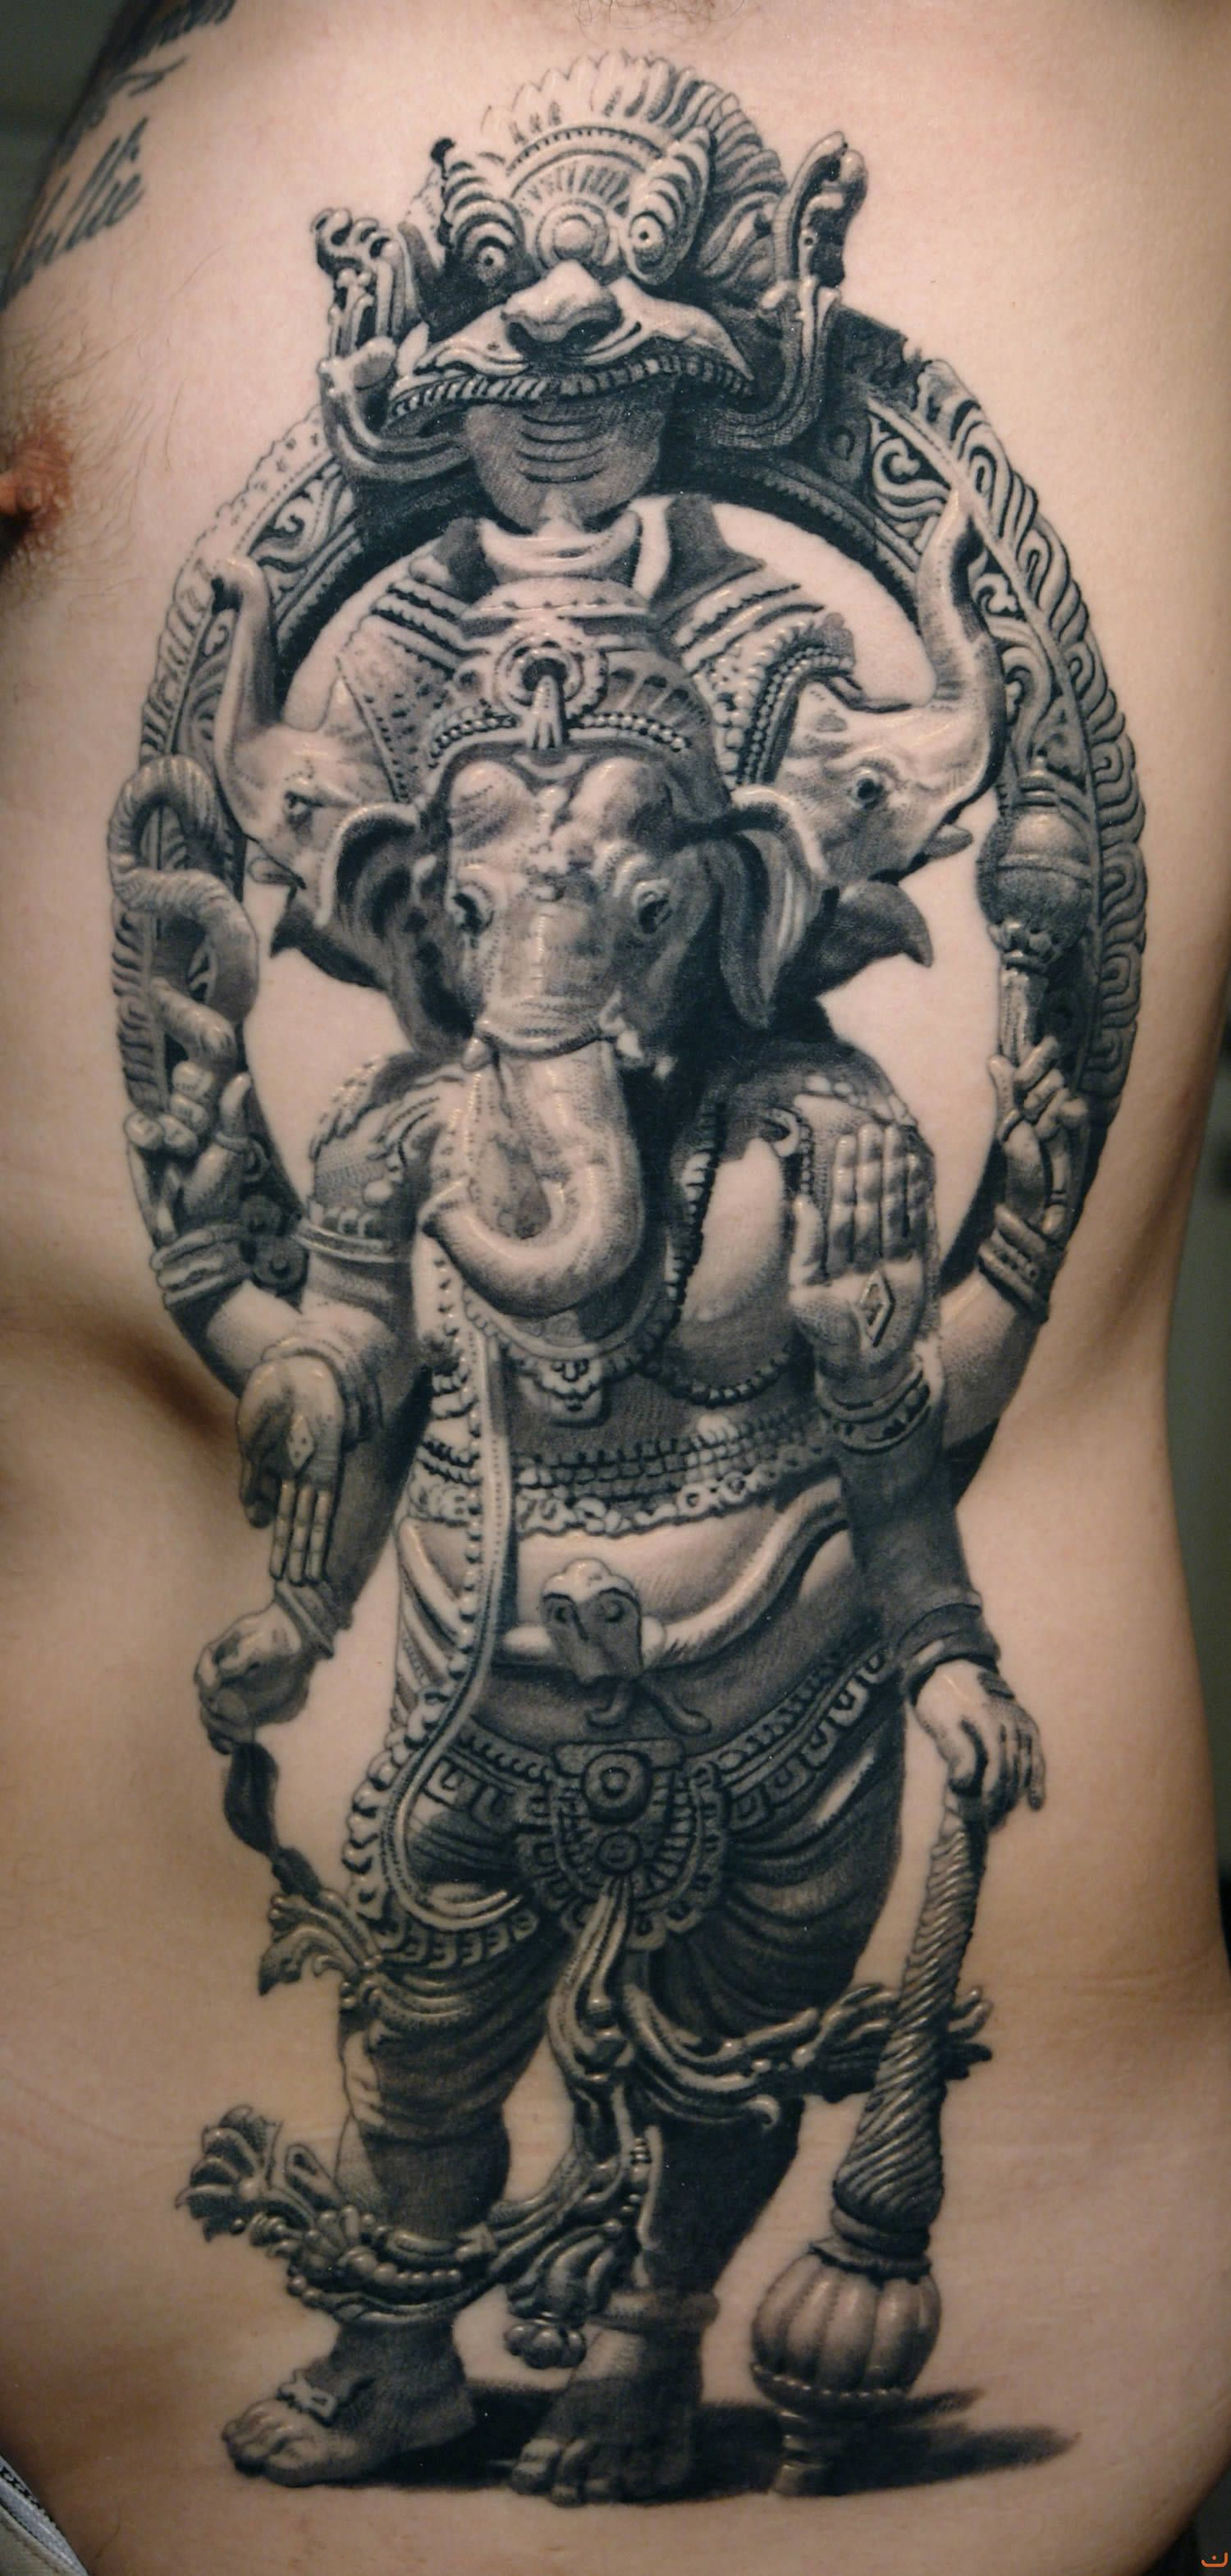 11 ganesha tattoo designs ideas and samples - Ganesha Tattoo By Sergiu Sanchez